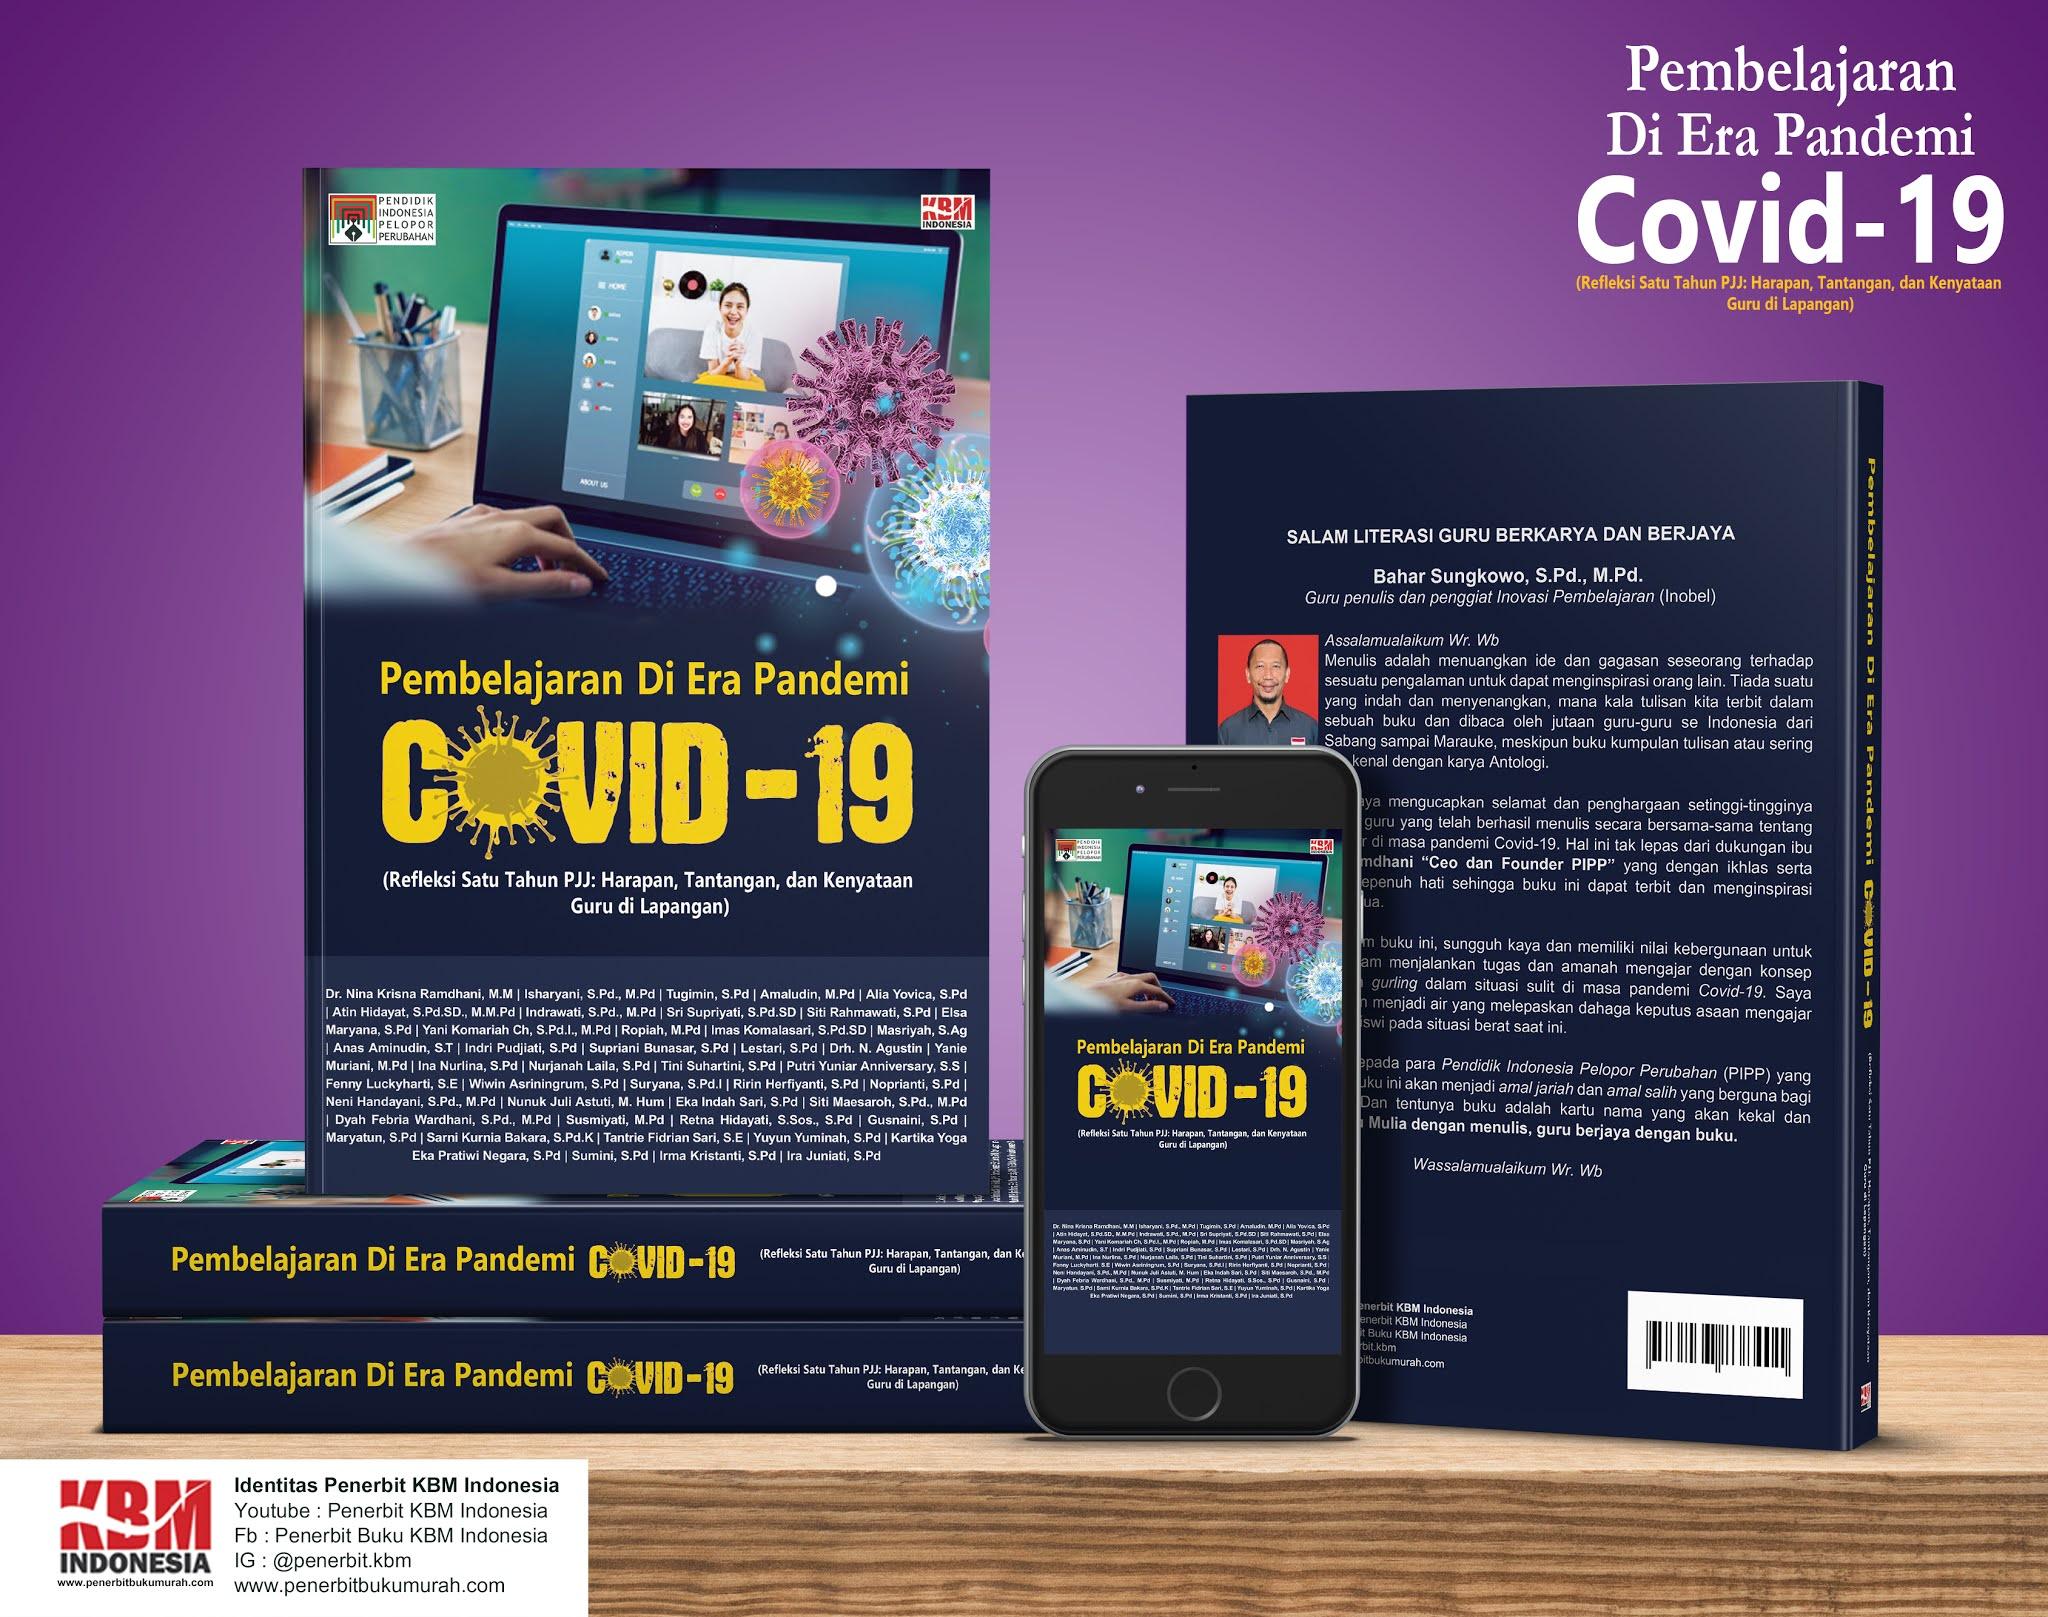 PEMBELAJARAN DI ERA PANDEMI COVID-19